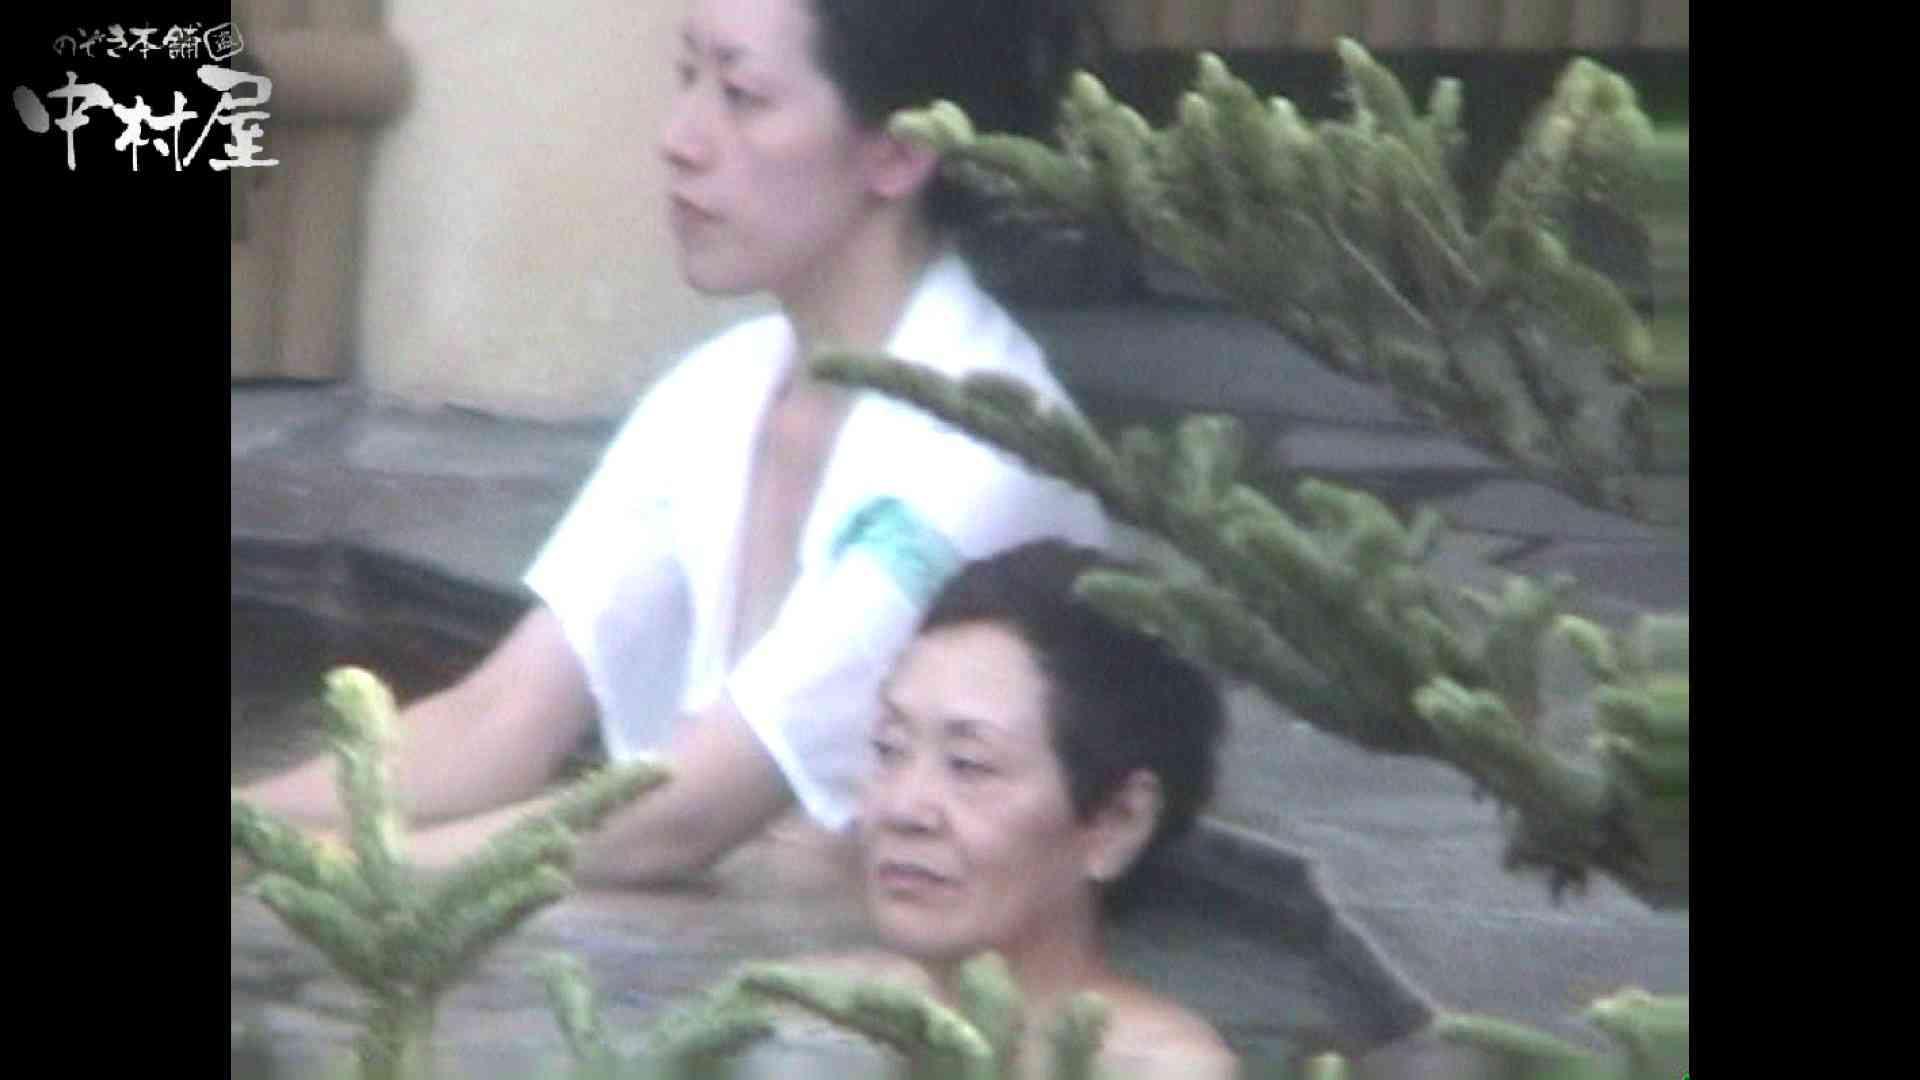 Aquaな露天風呂Vol.960 OLのプライベート   盗撮特撮  12pic 4